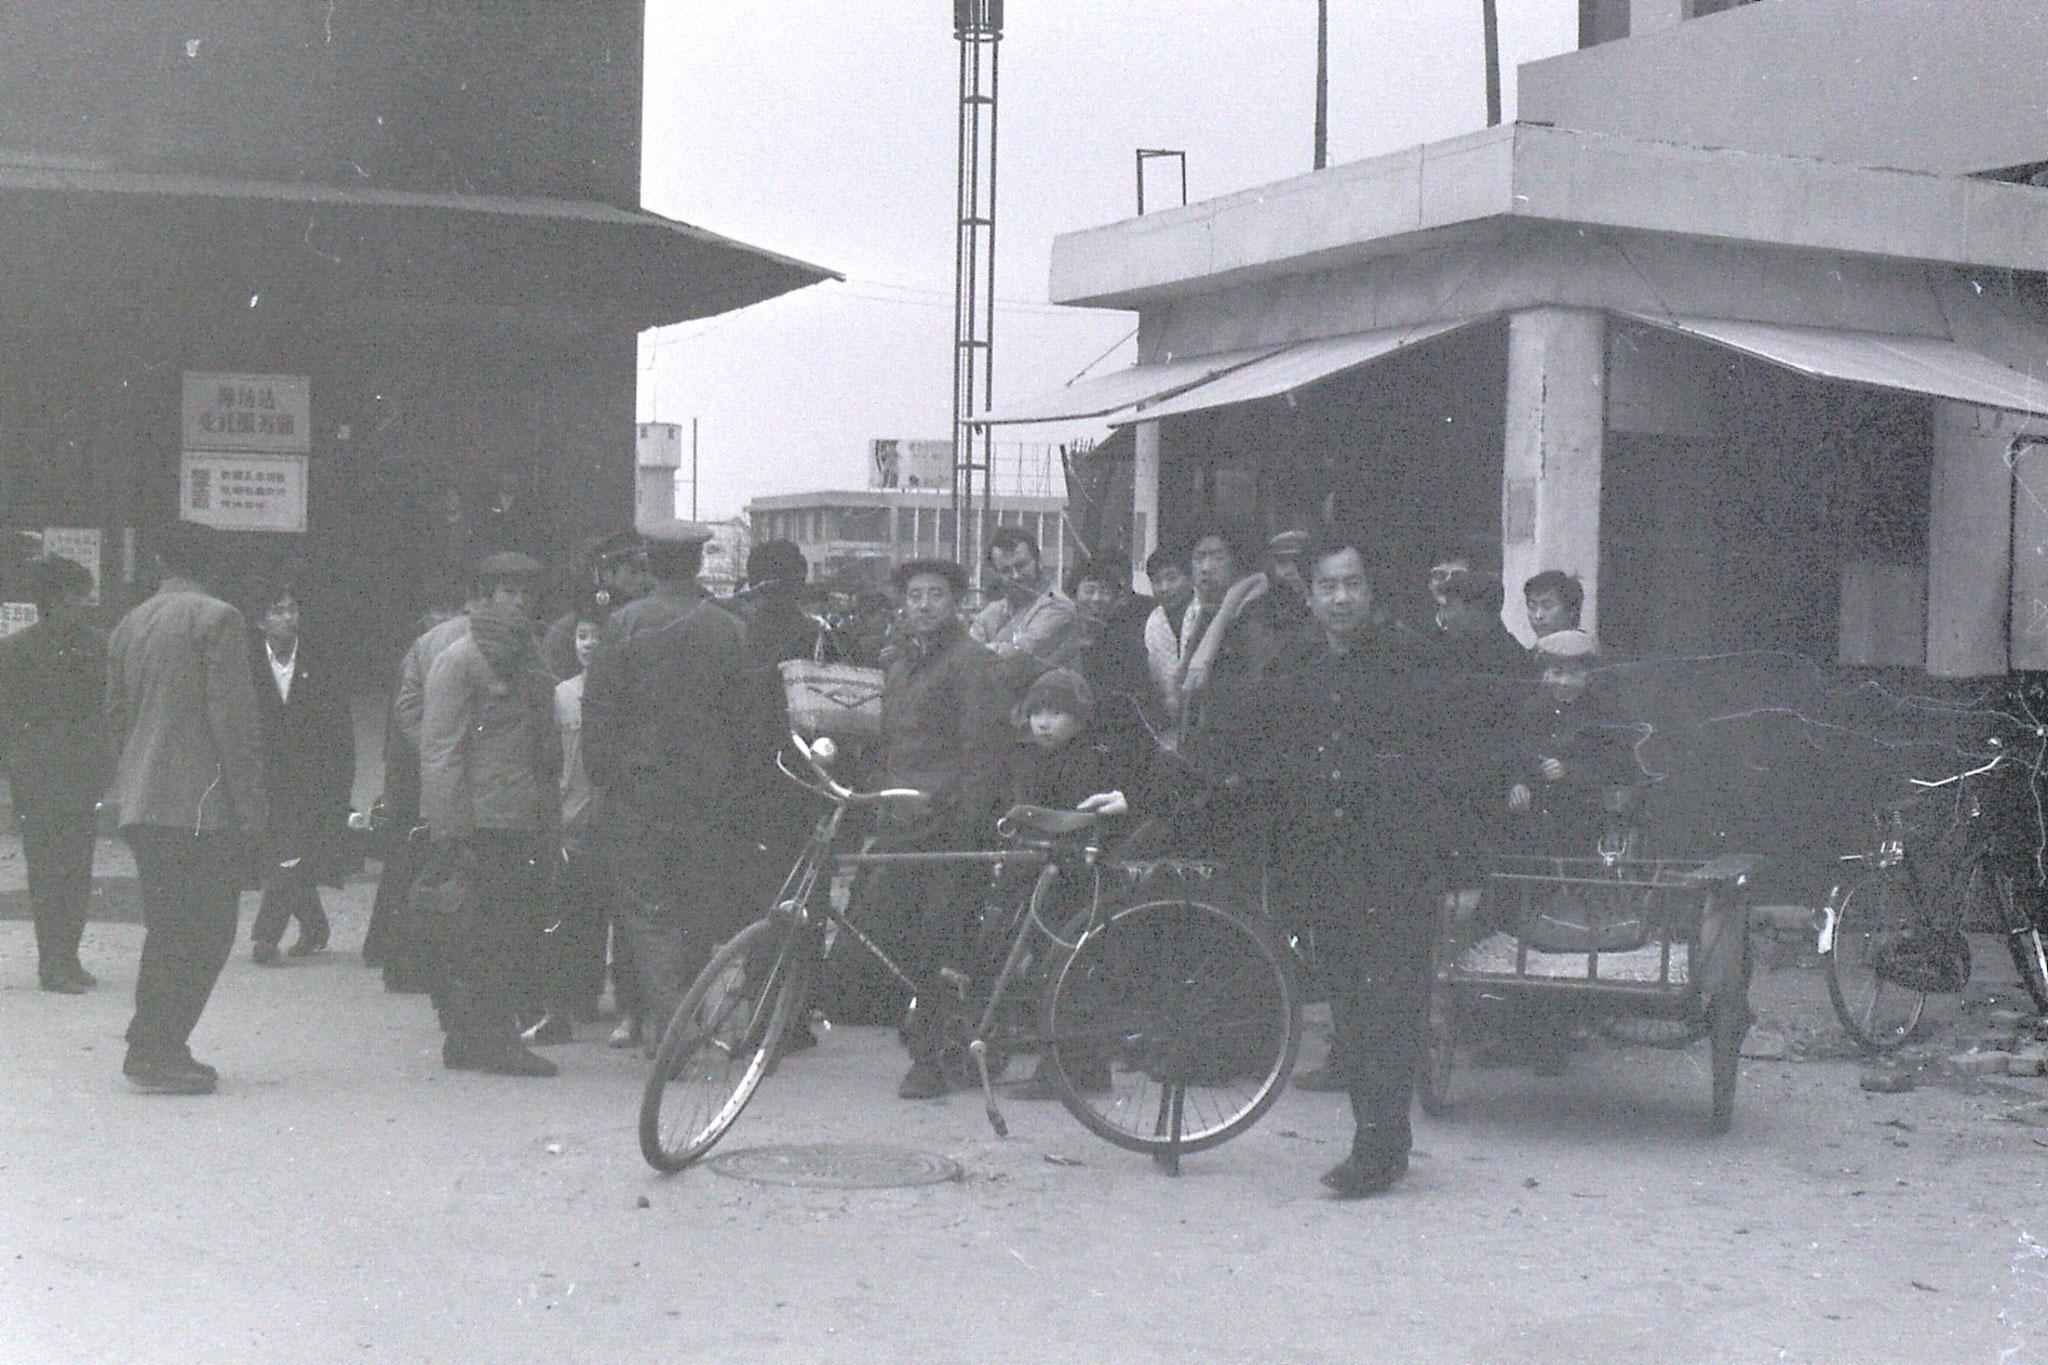 14/2/1989: 35: Weifang station